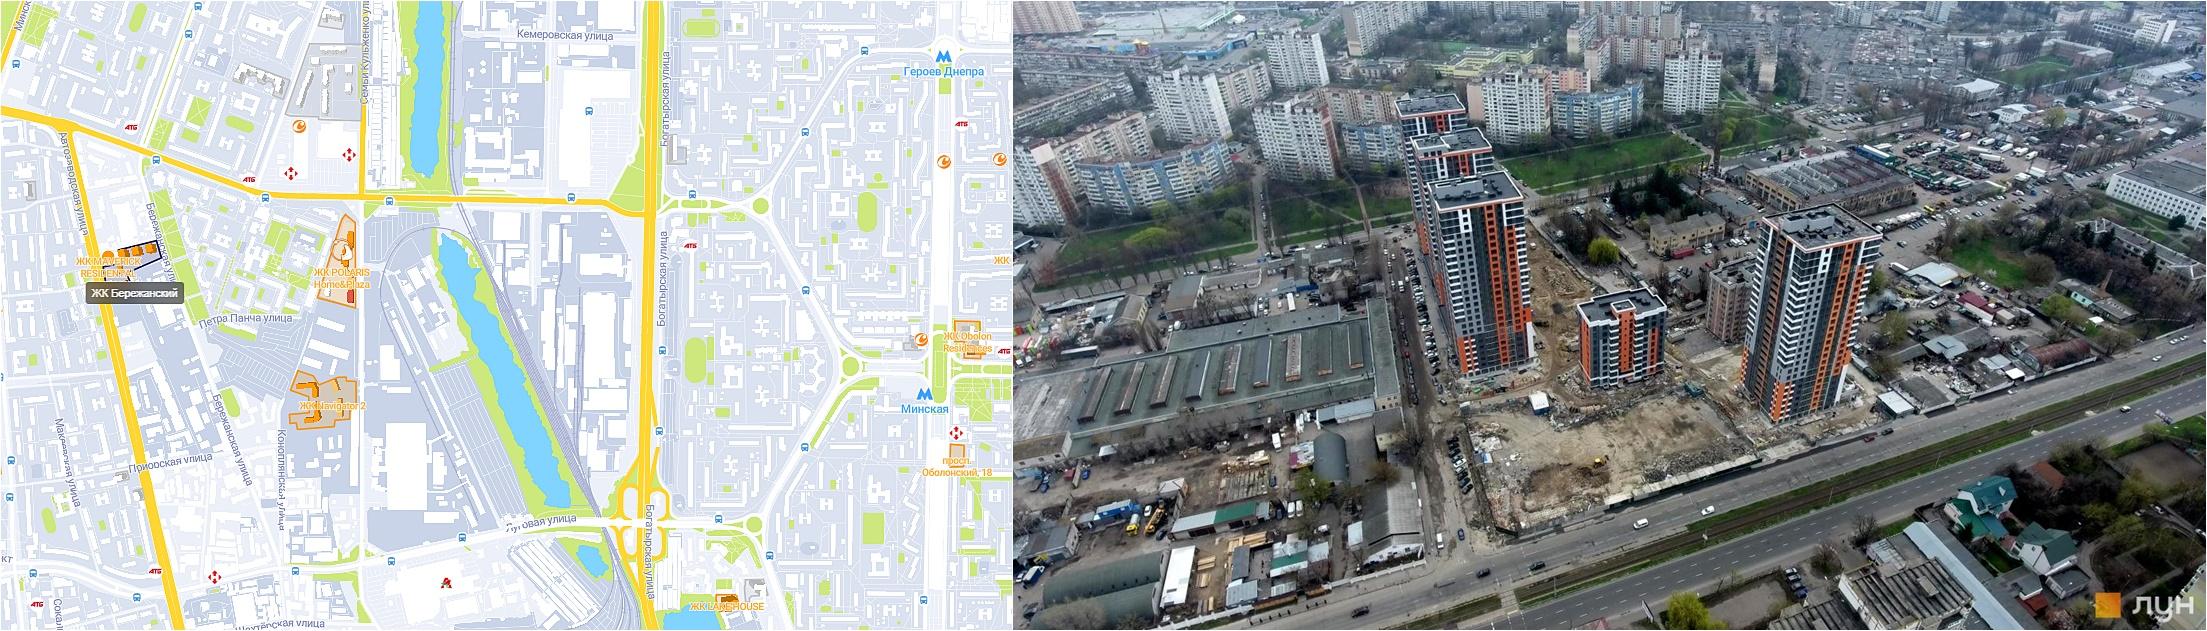 ЖК Бережанский на карте и аэрооблет